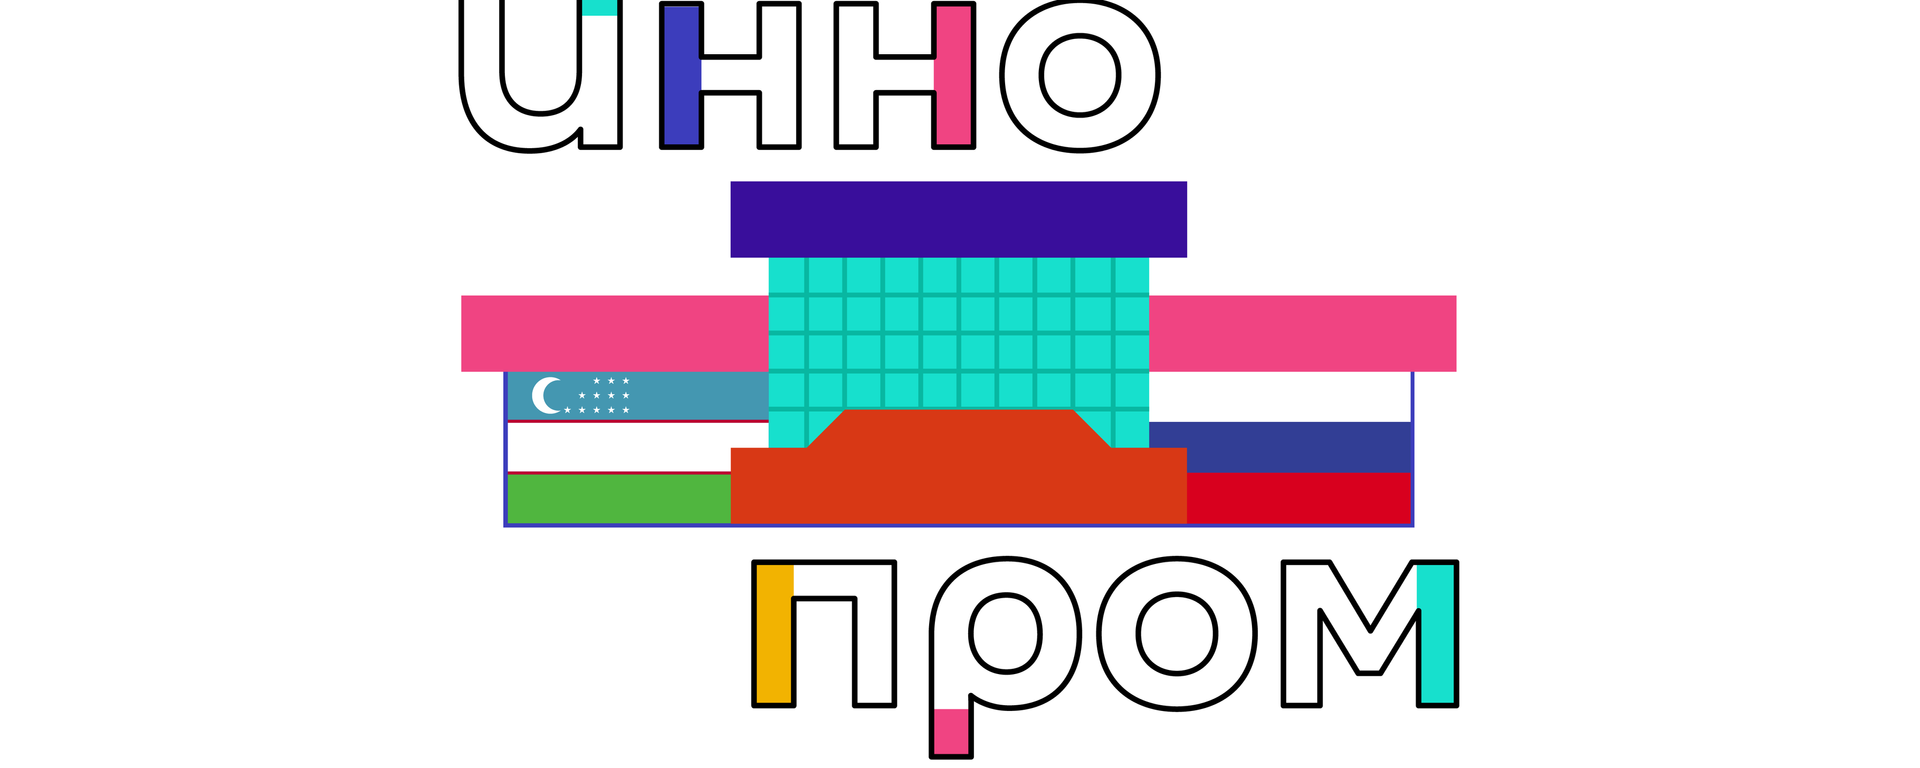 Иннопром - Sputnik Узбекистан, 1920, 08.04.2021